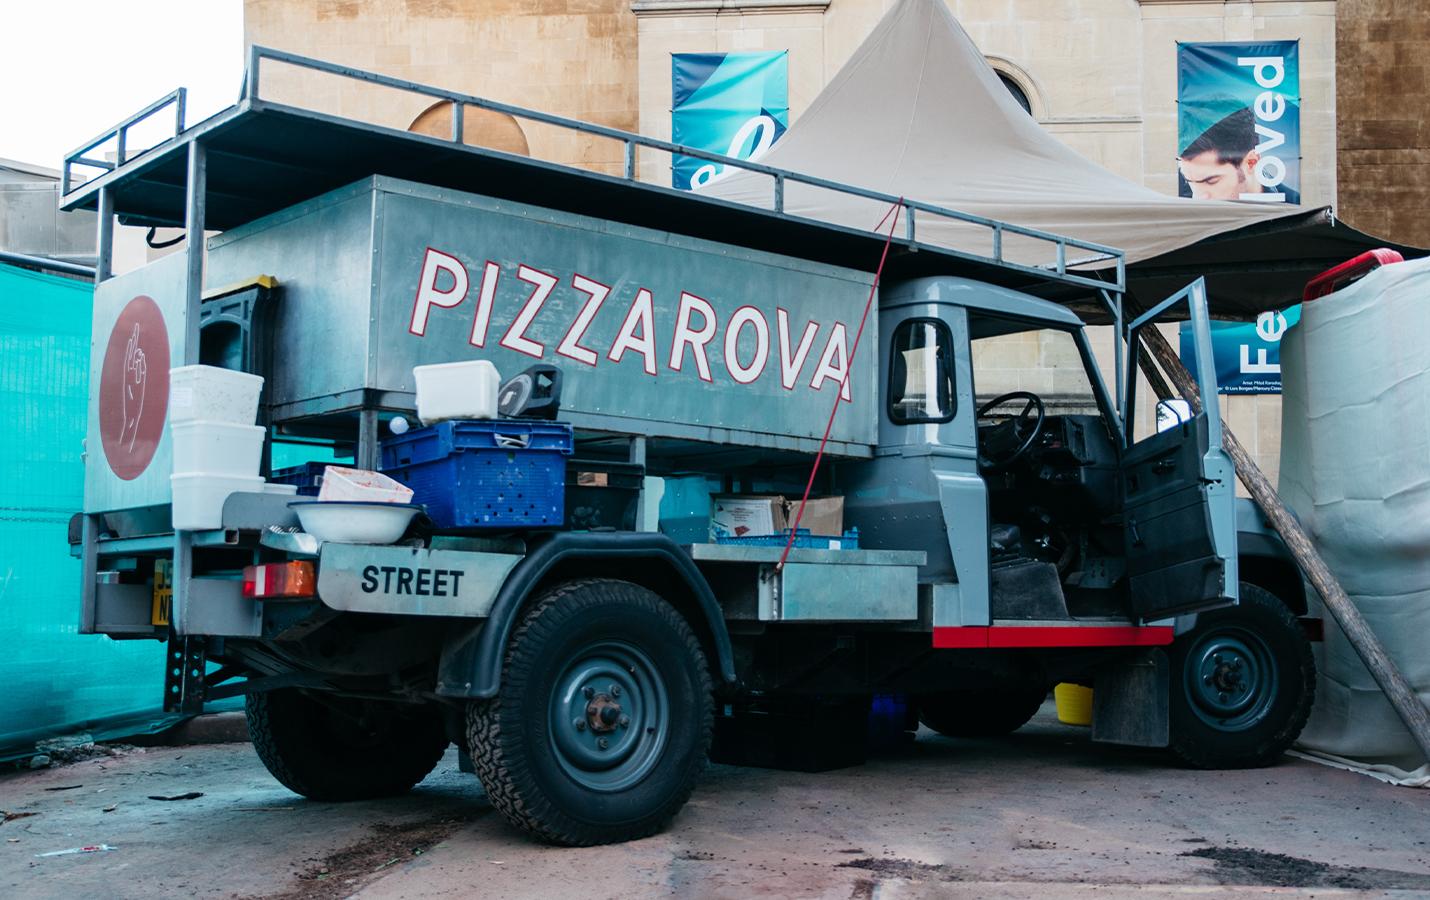 Exterior of Pizzarova Land Rover parked in Bristol